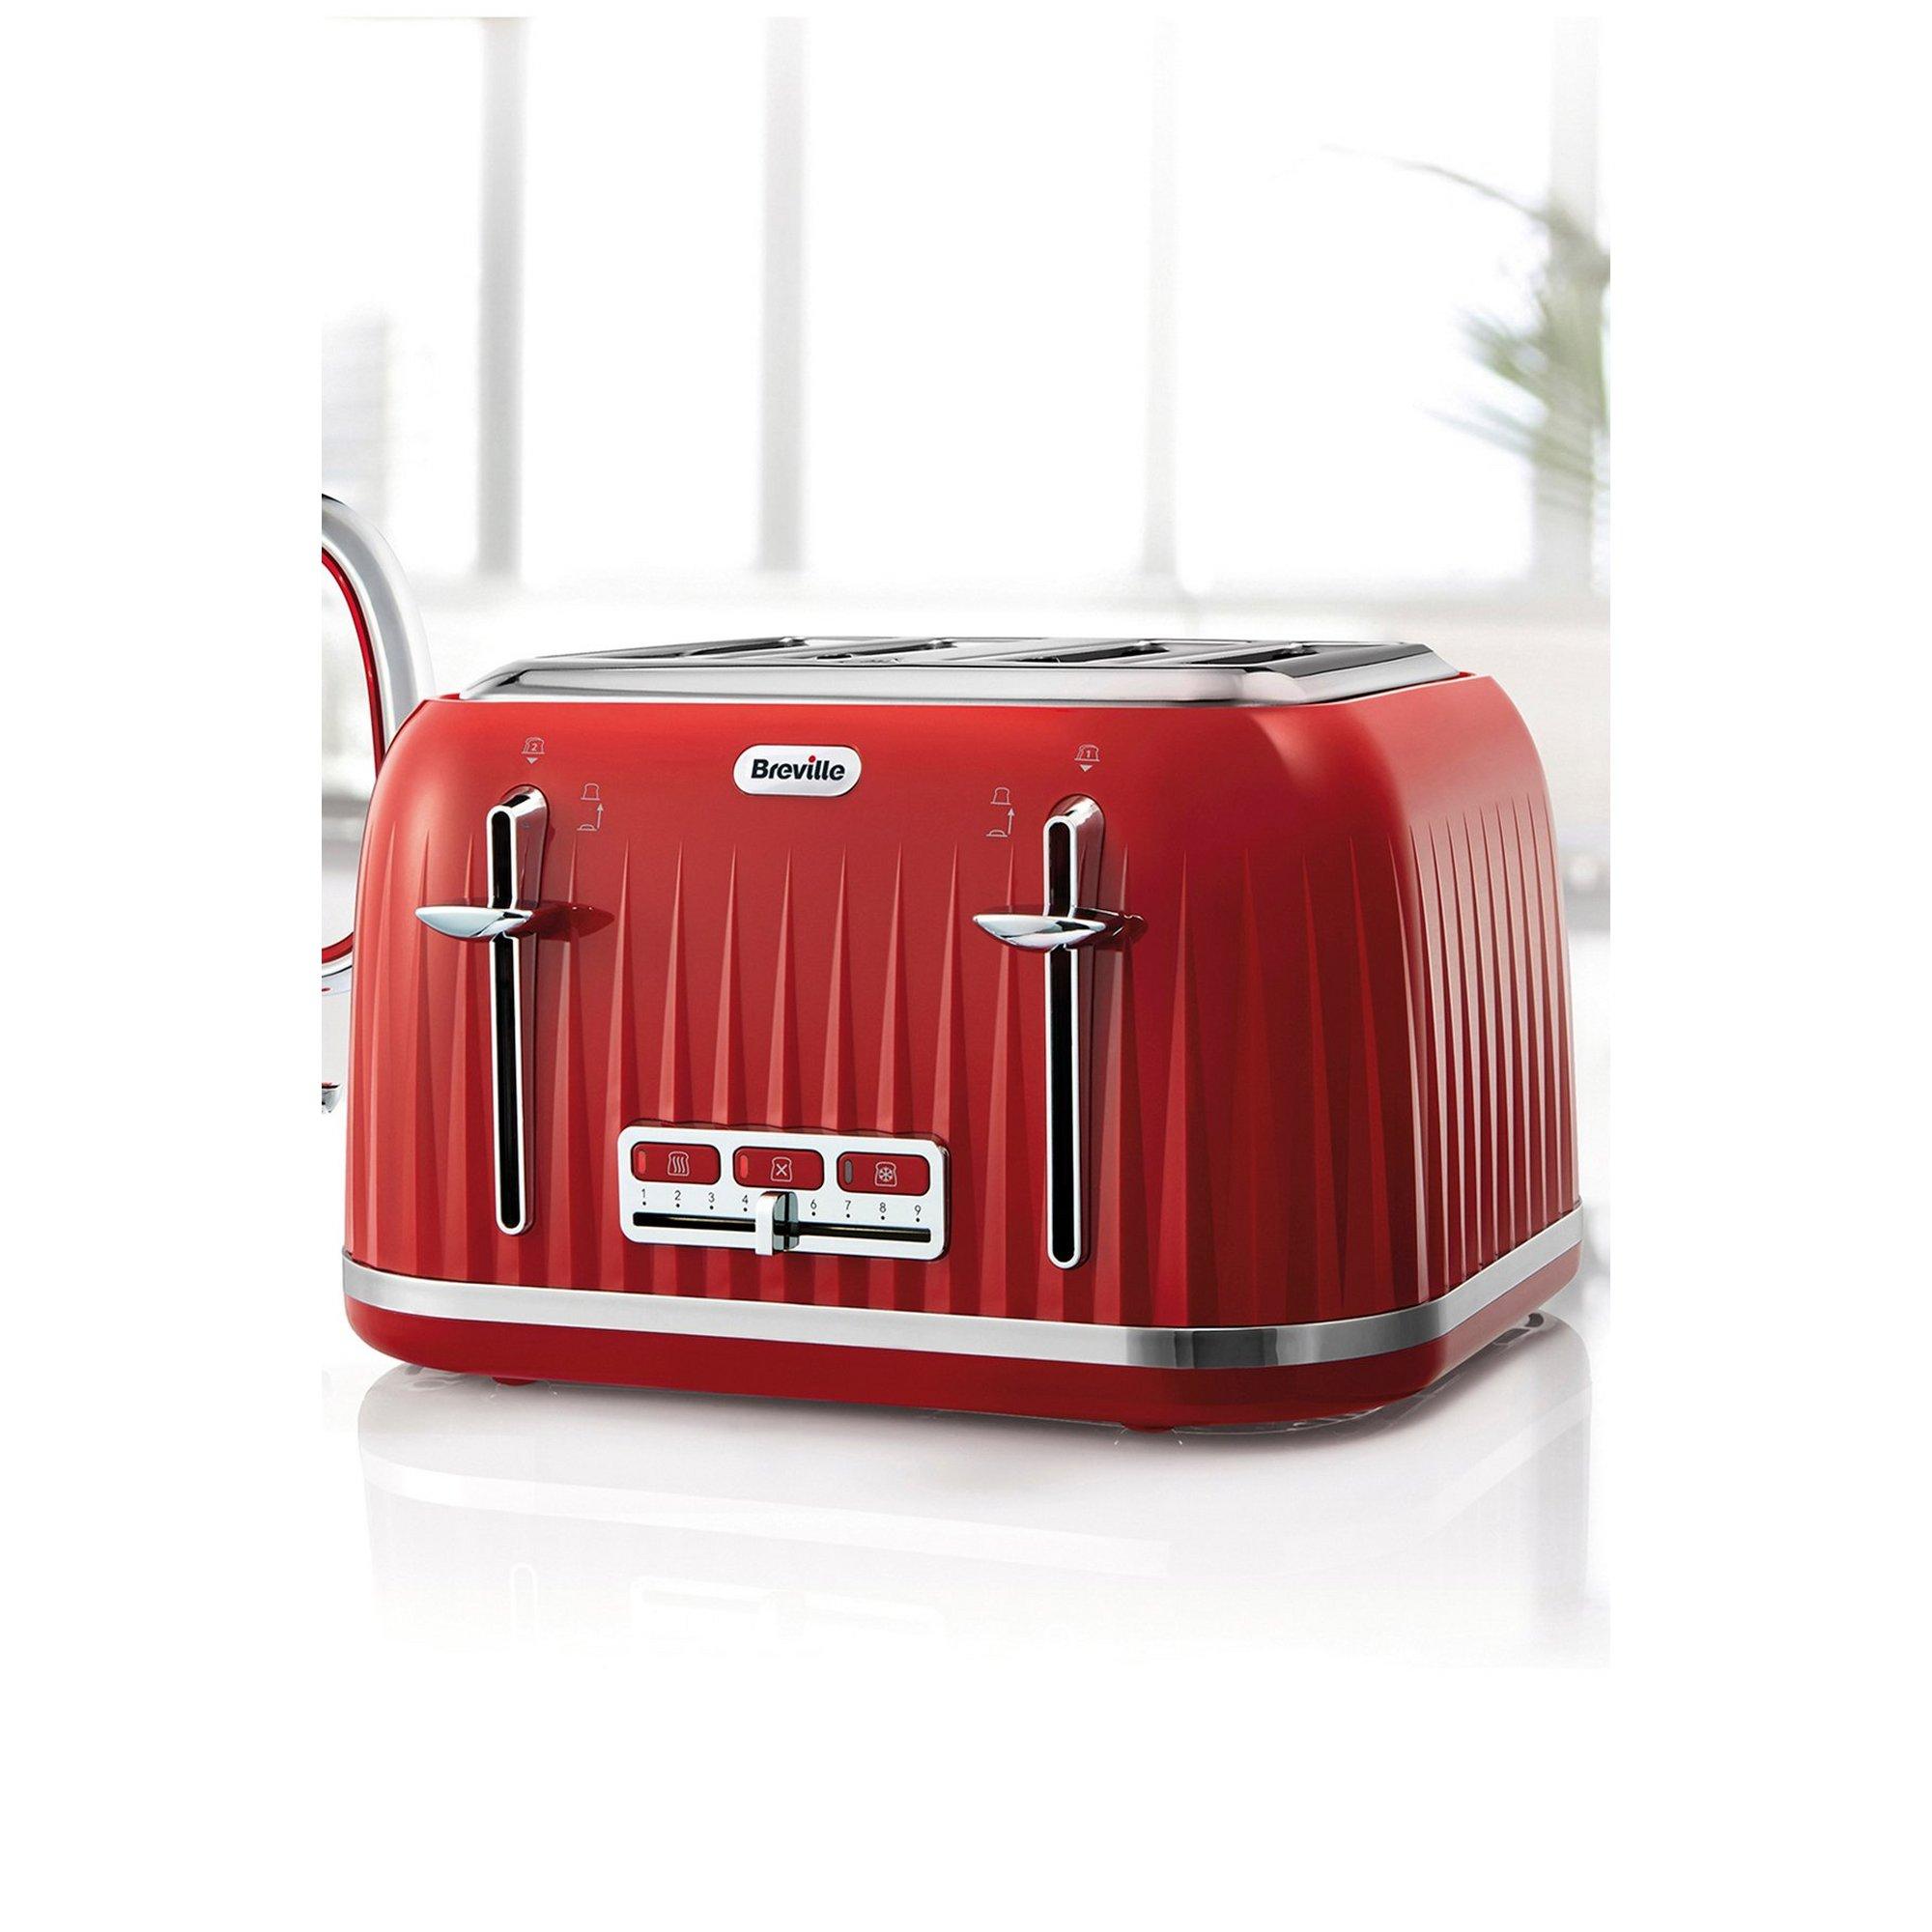 Image of Breville Impressions 4-Slice Toaster